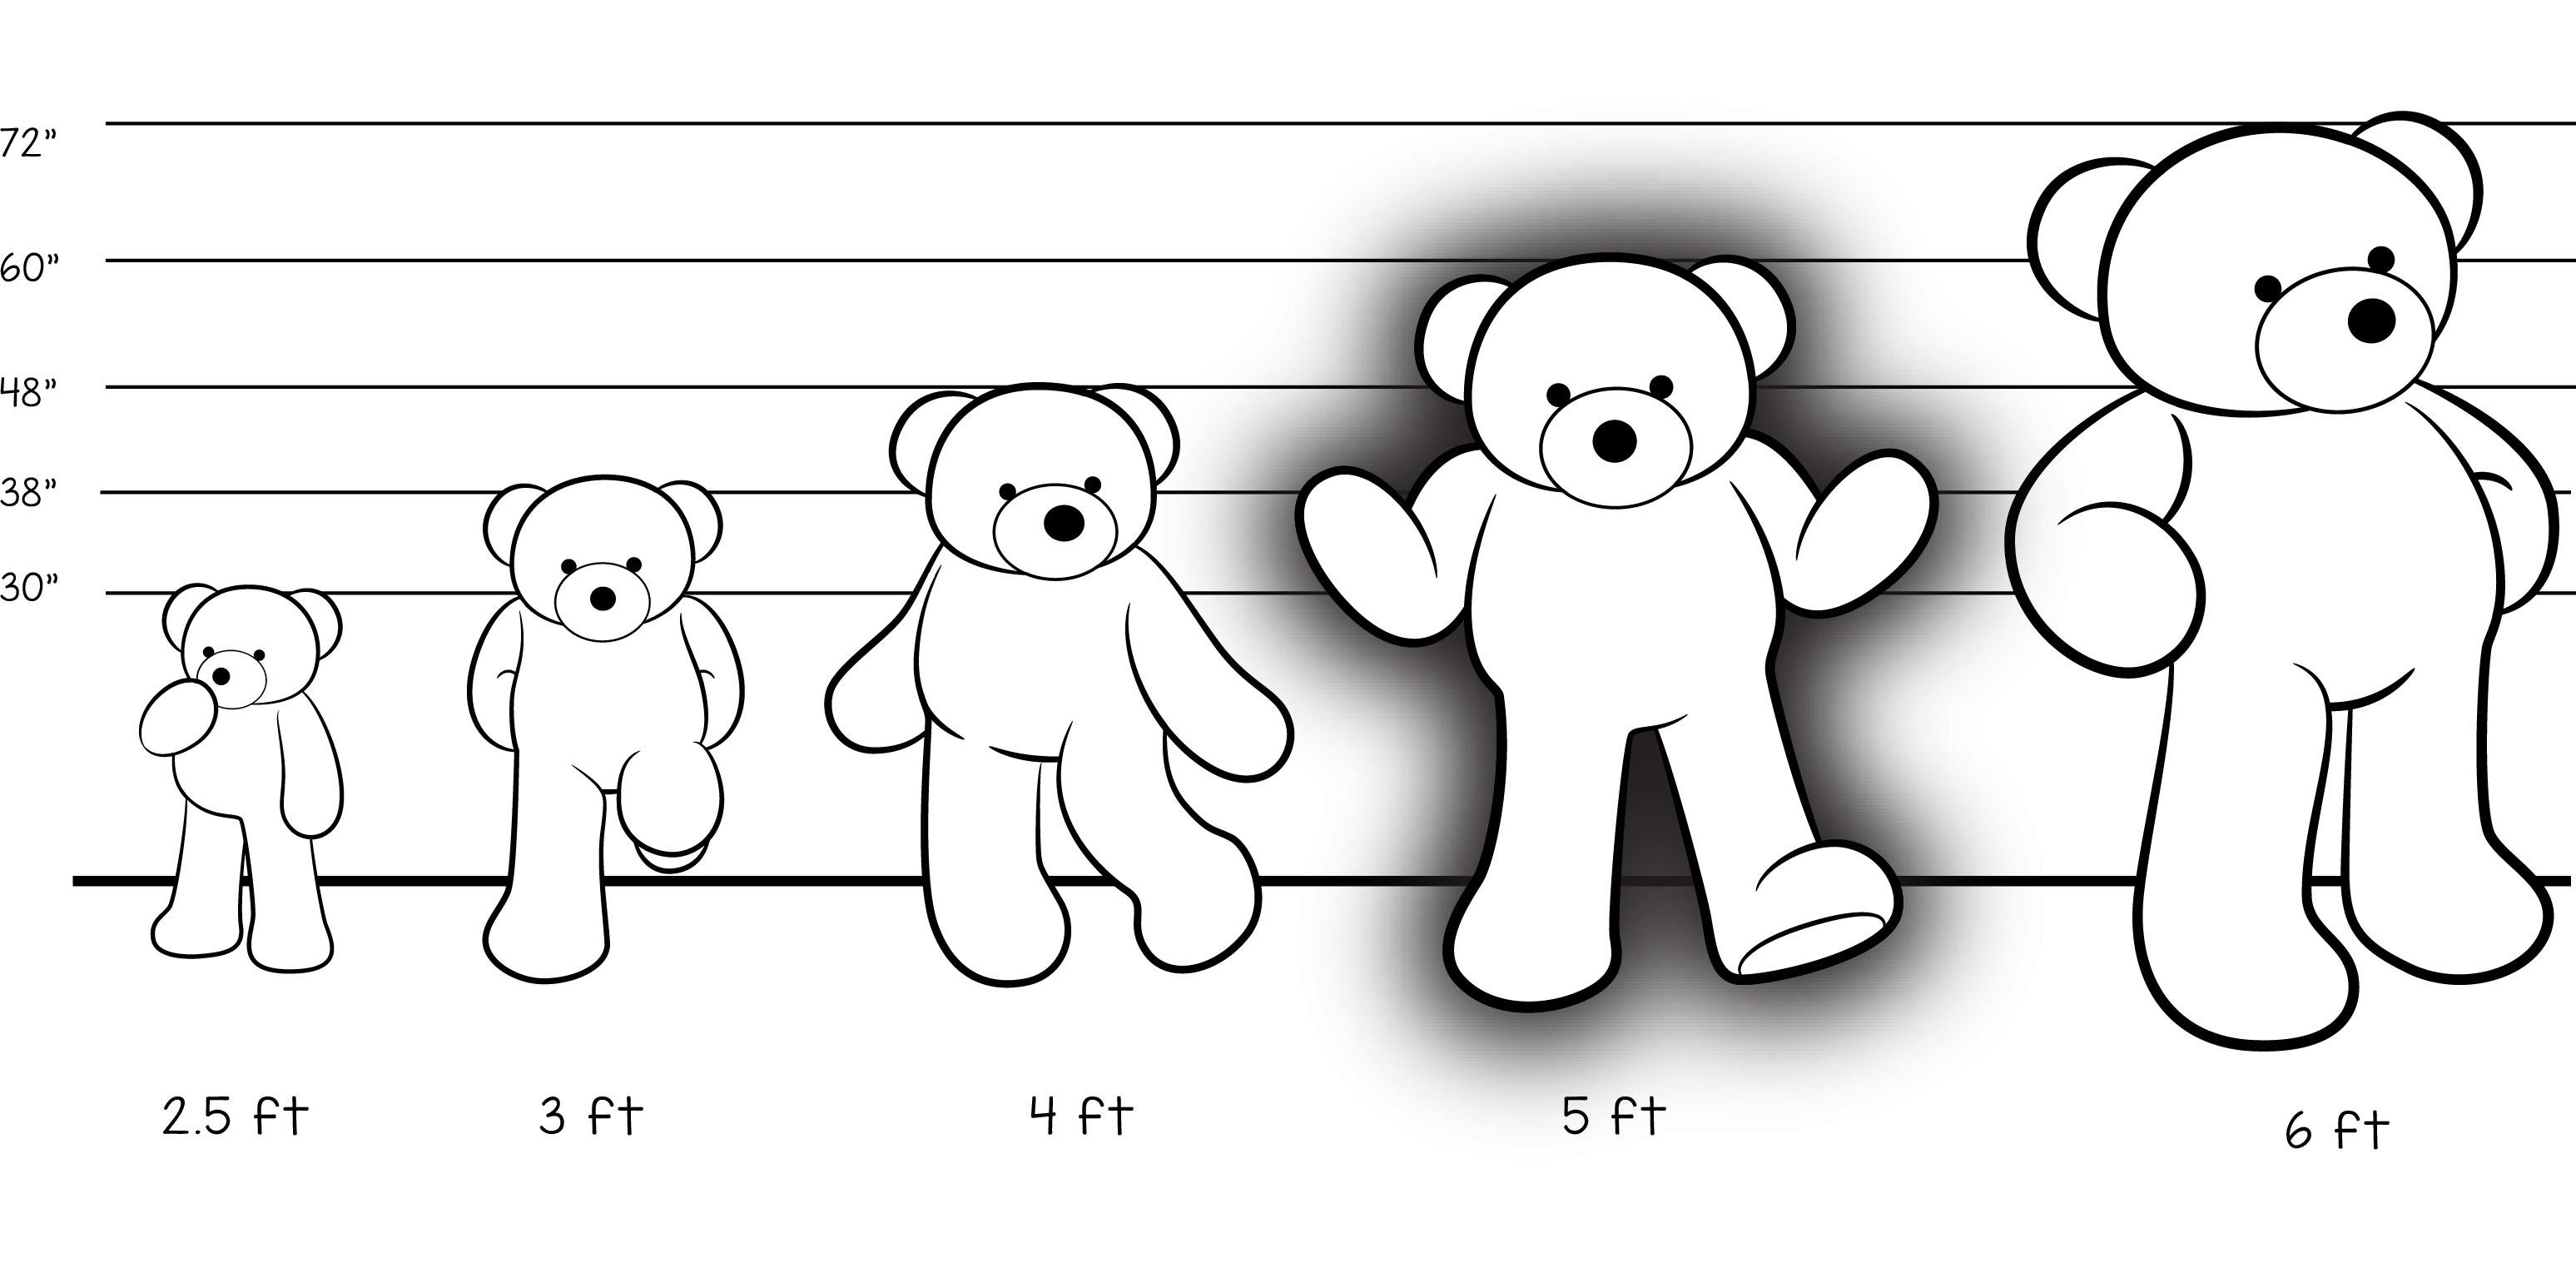 chubs-lineup-5ft.jpg